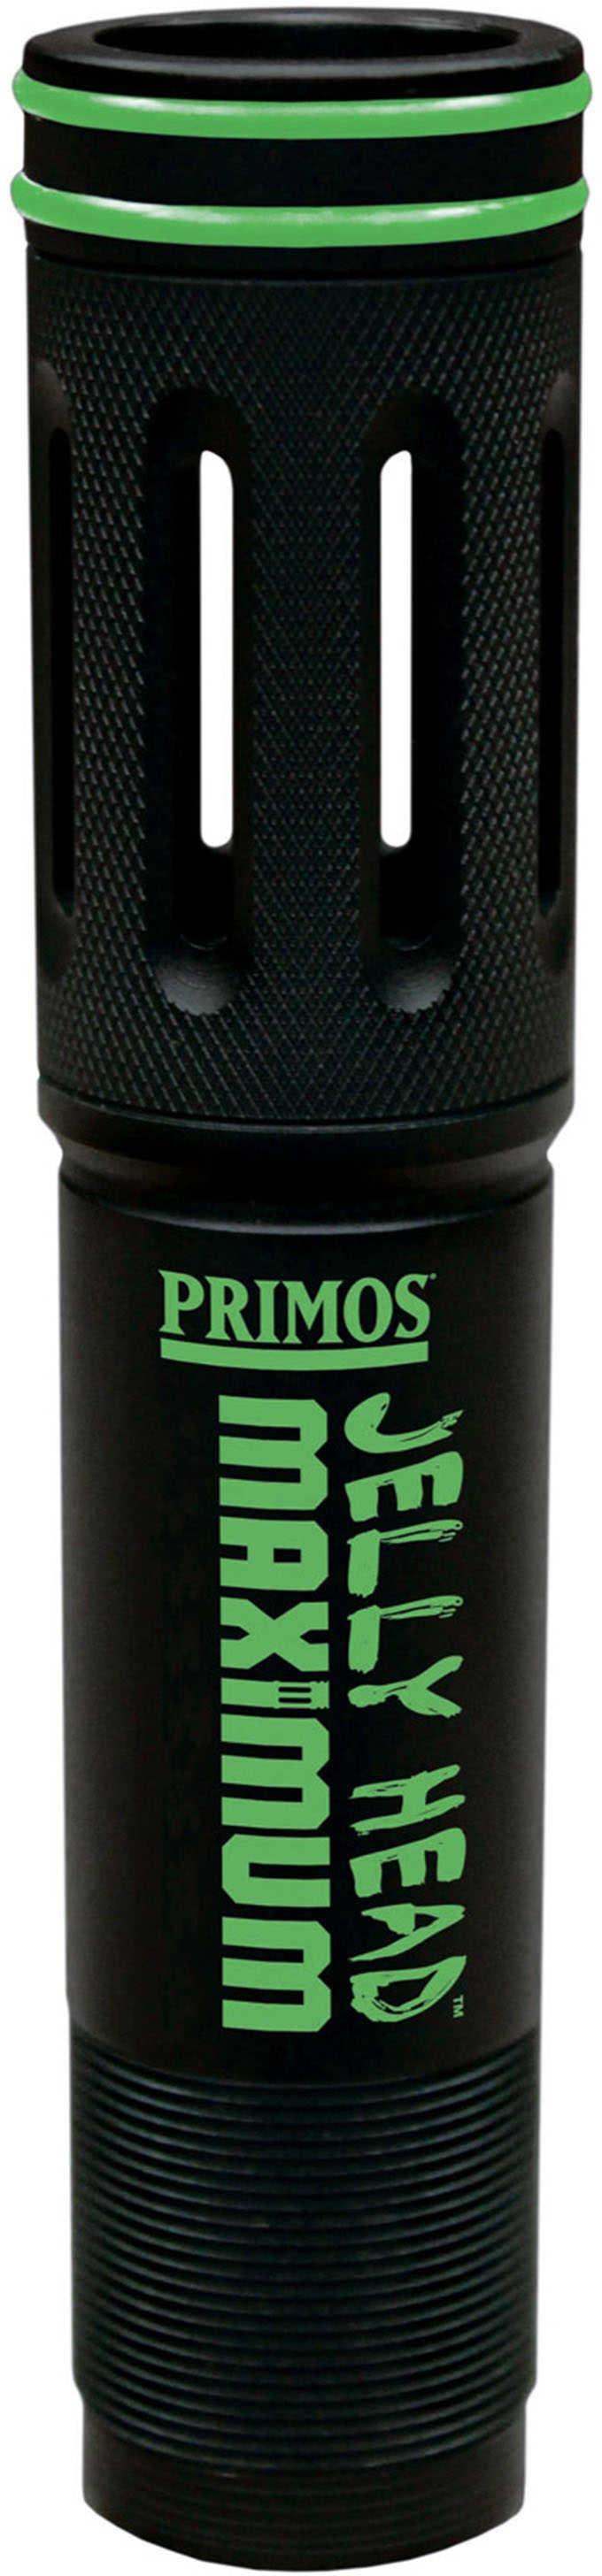 Primos Jelly Head Maximum Range Turkey Choke Tube Beretta Xtrema I & II 12 Gauge .660 Constriction Md: 69408